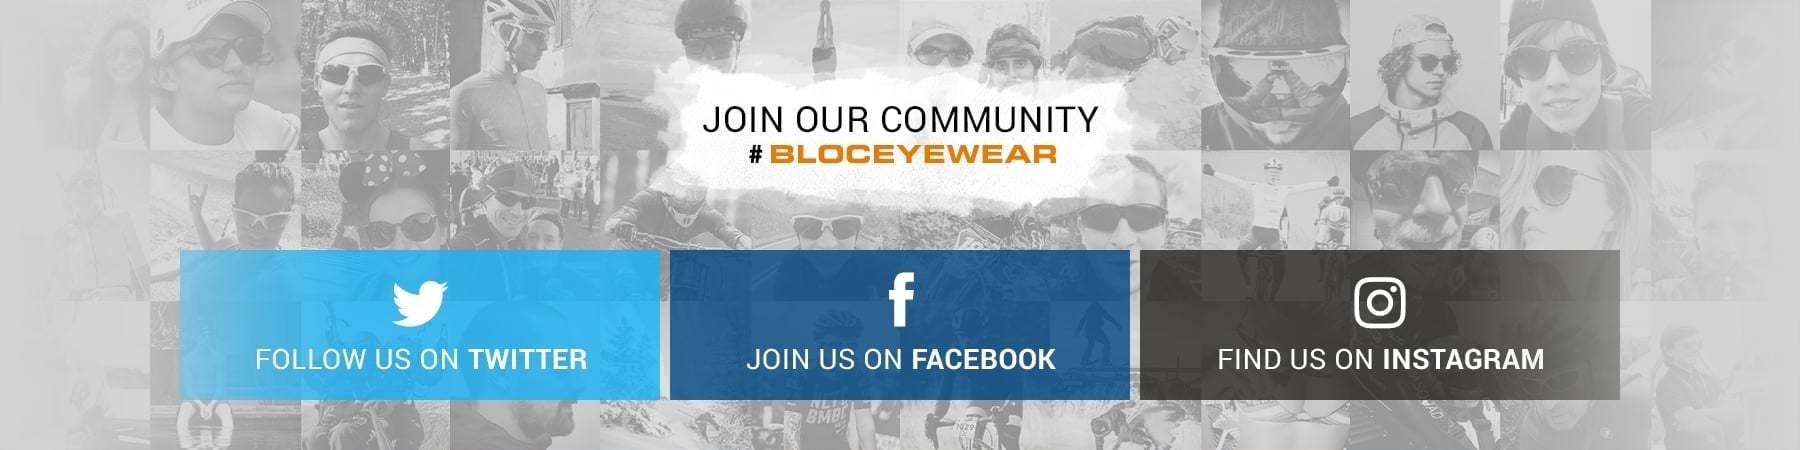 02a8b3b7886 BLOC Eyewear